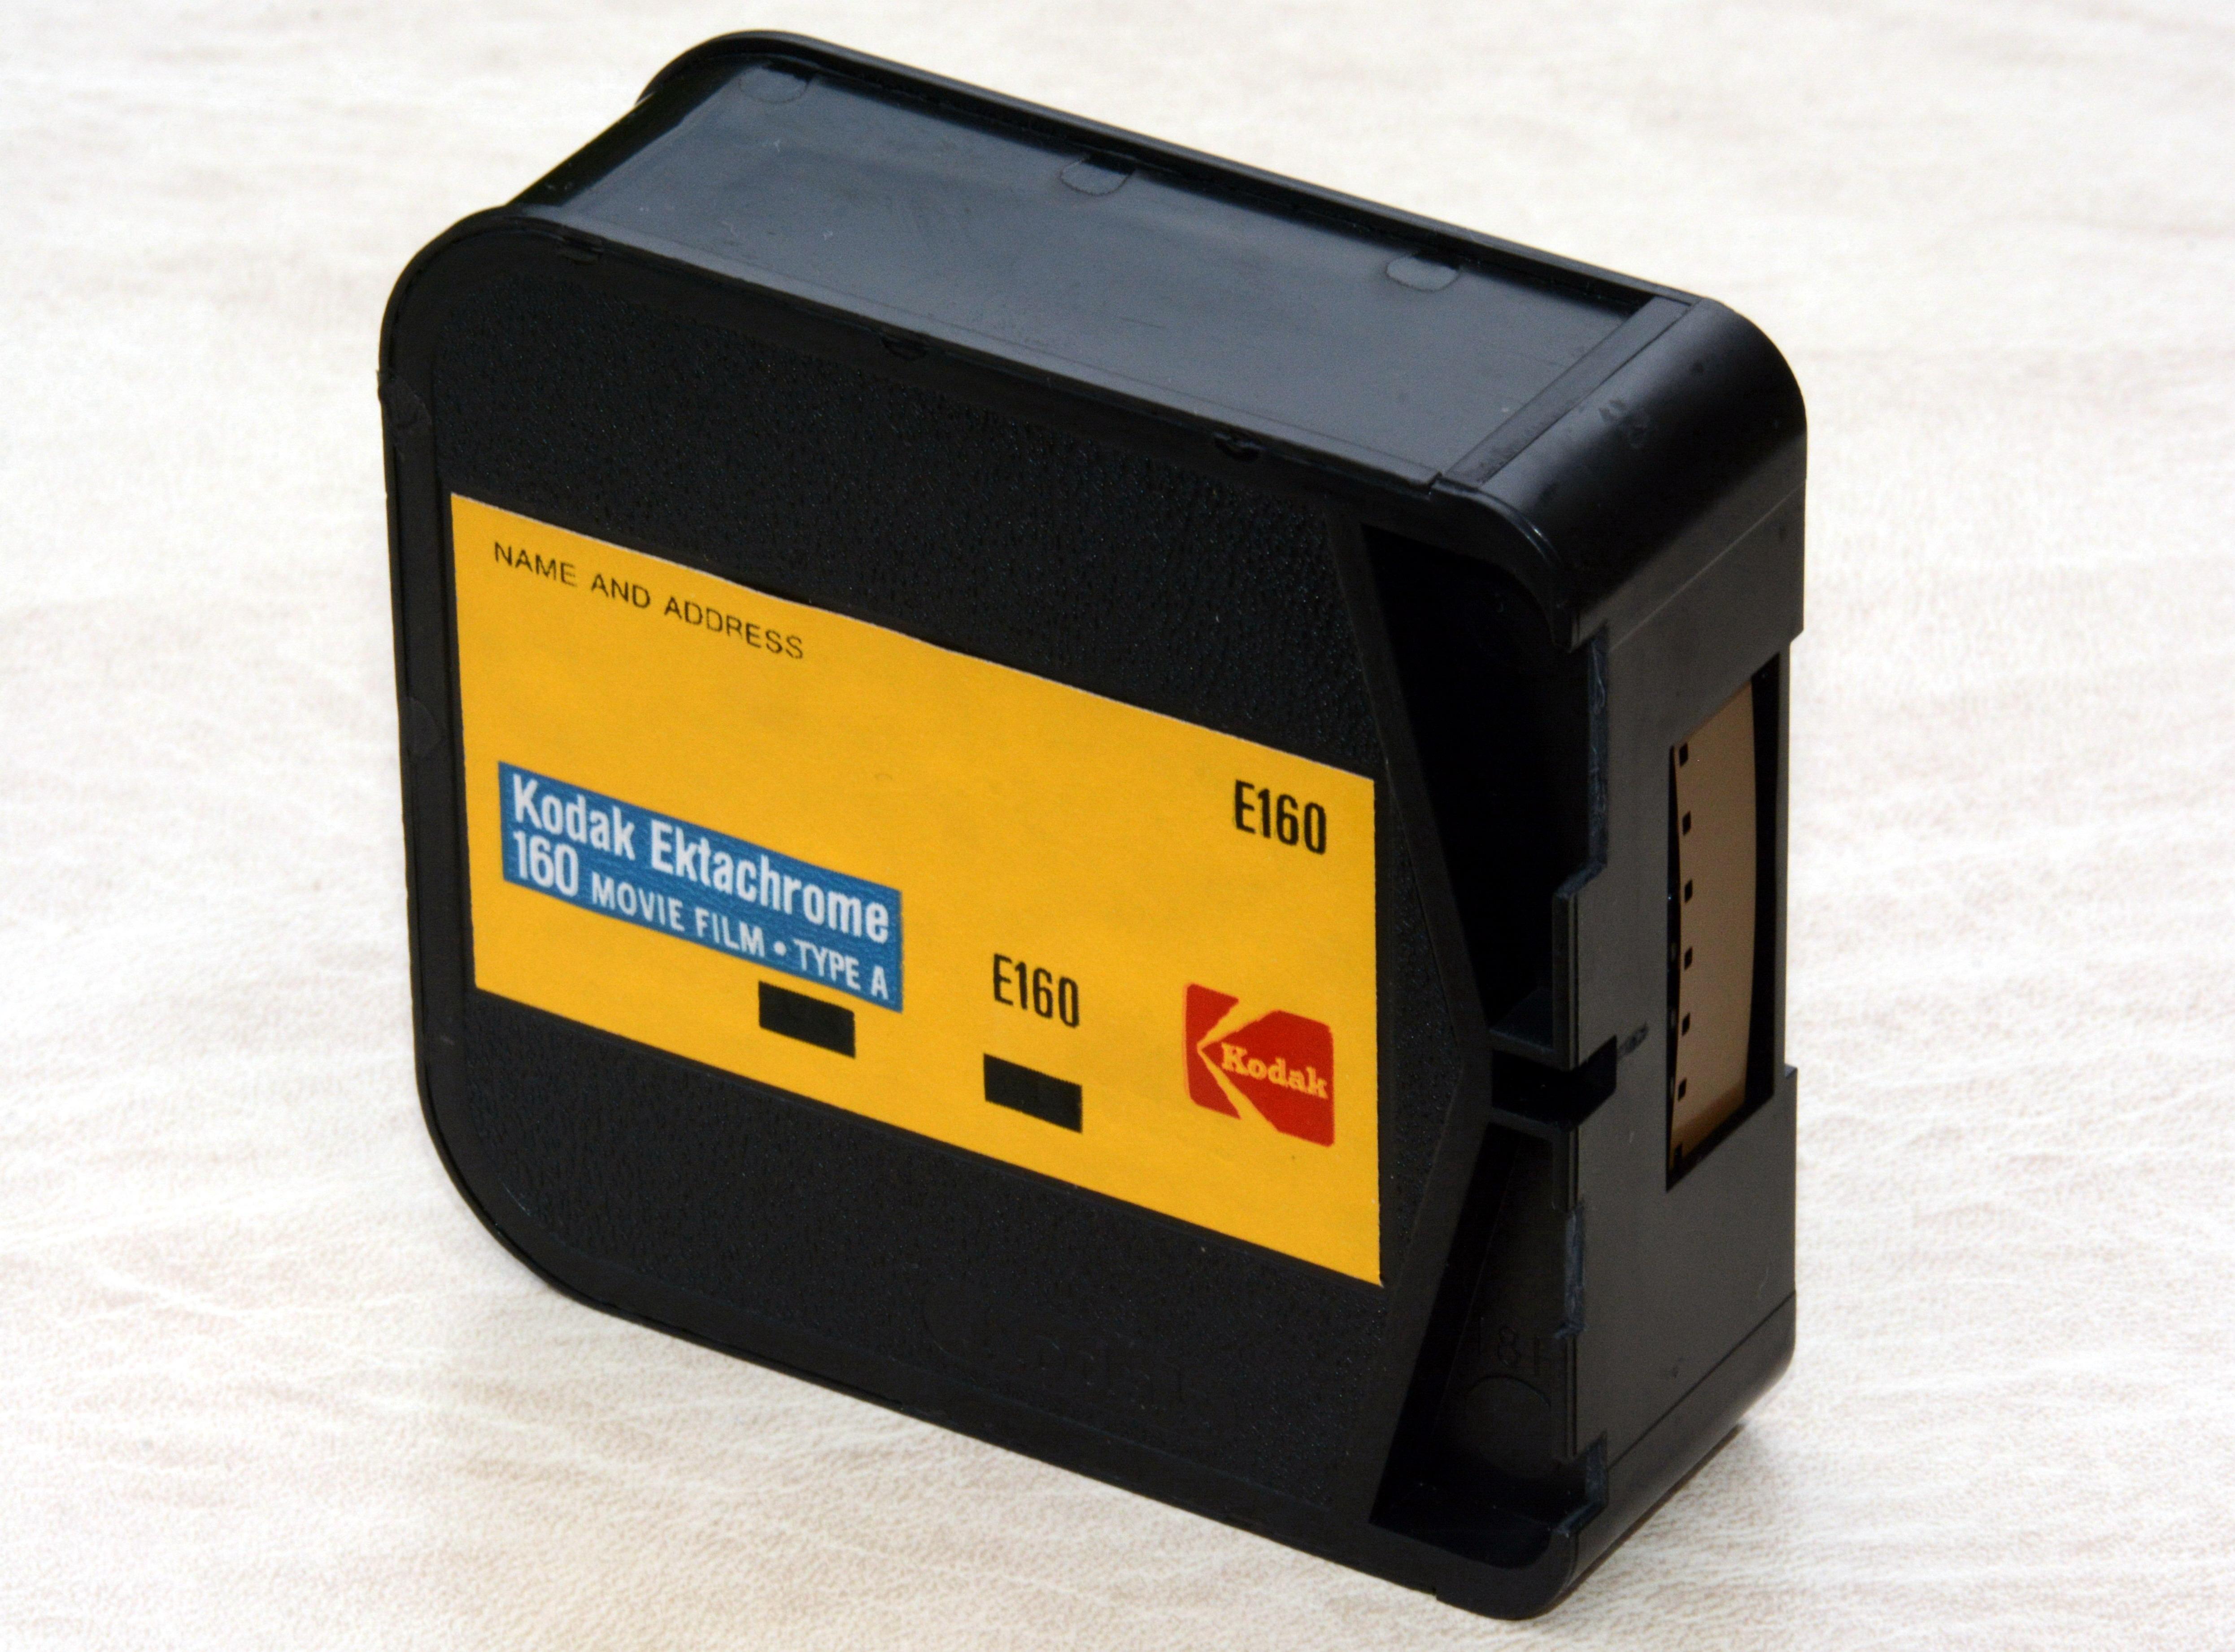 file kodak ektachrome 160 type a super 8 film cartridge. Black Bedroom Furniture Sets. Home Design Ideas